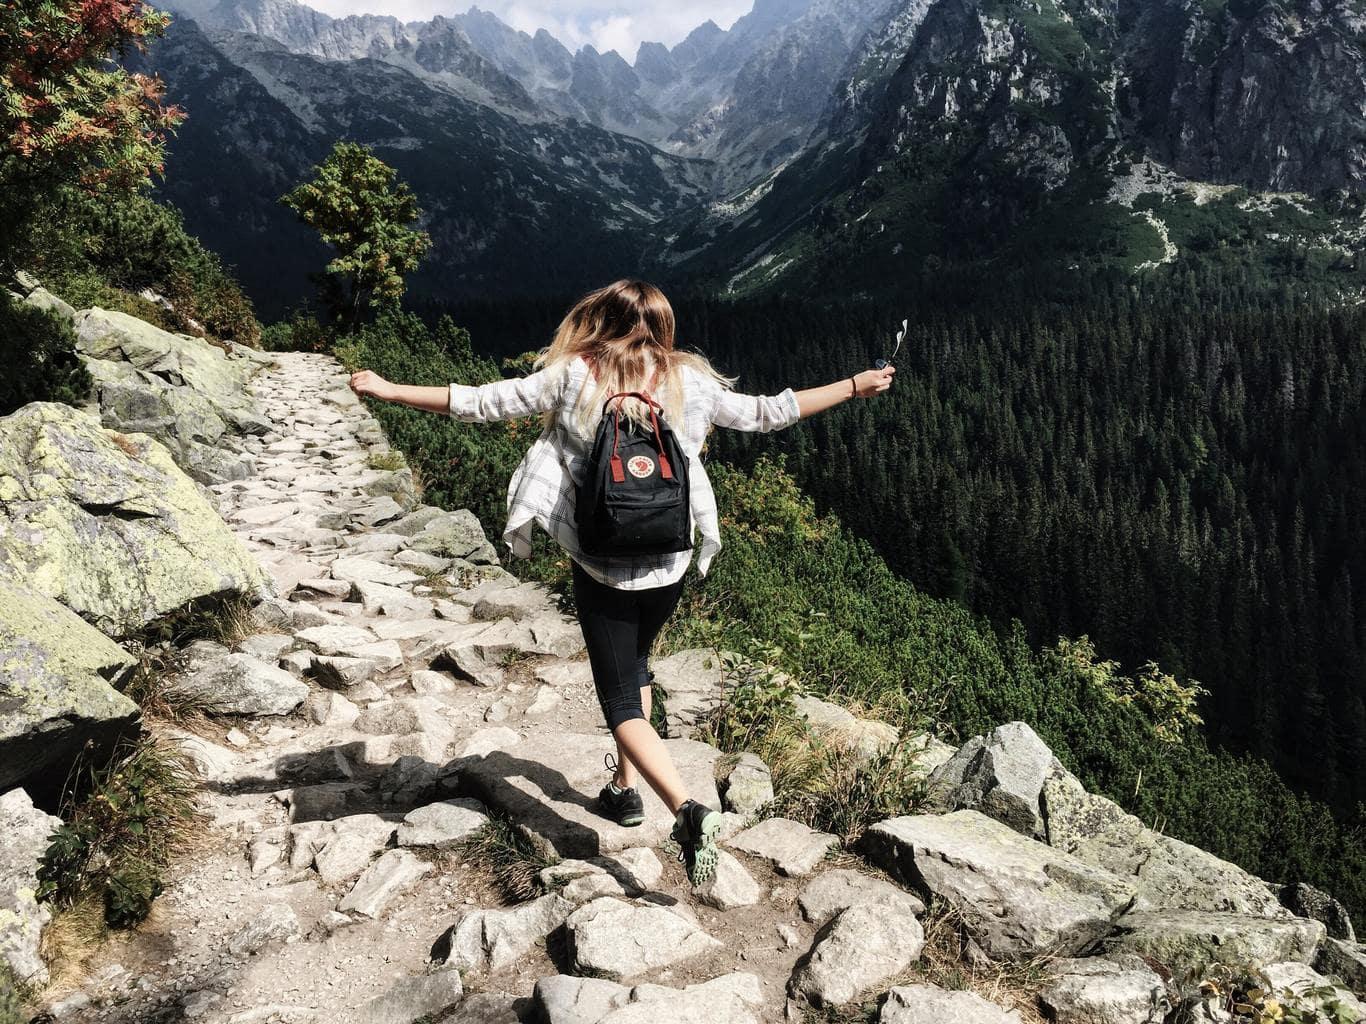 girl, outdoors, adventure, hiking